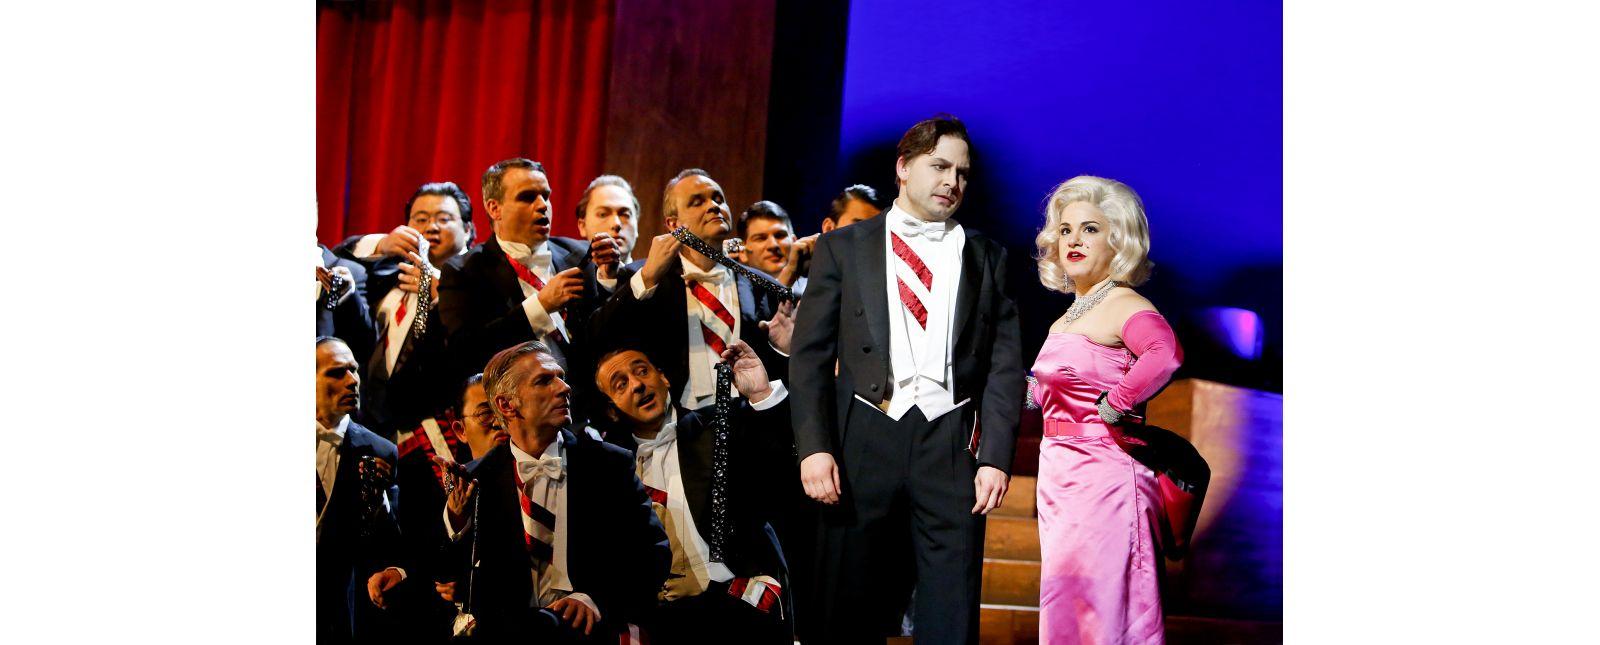 Love Life // Opernchor des Theater Freiburg, David Arnsperger, Rebecca Jo Loeb // 2017 // Birgit Hupfeld